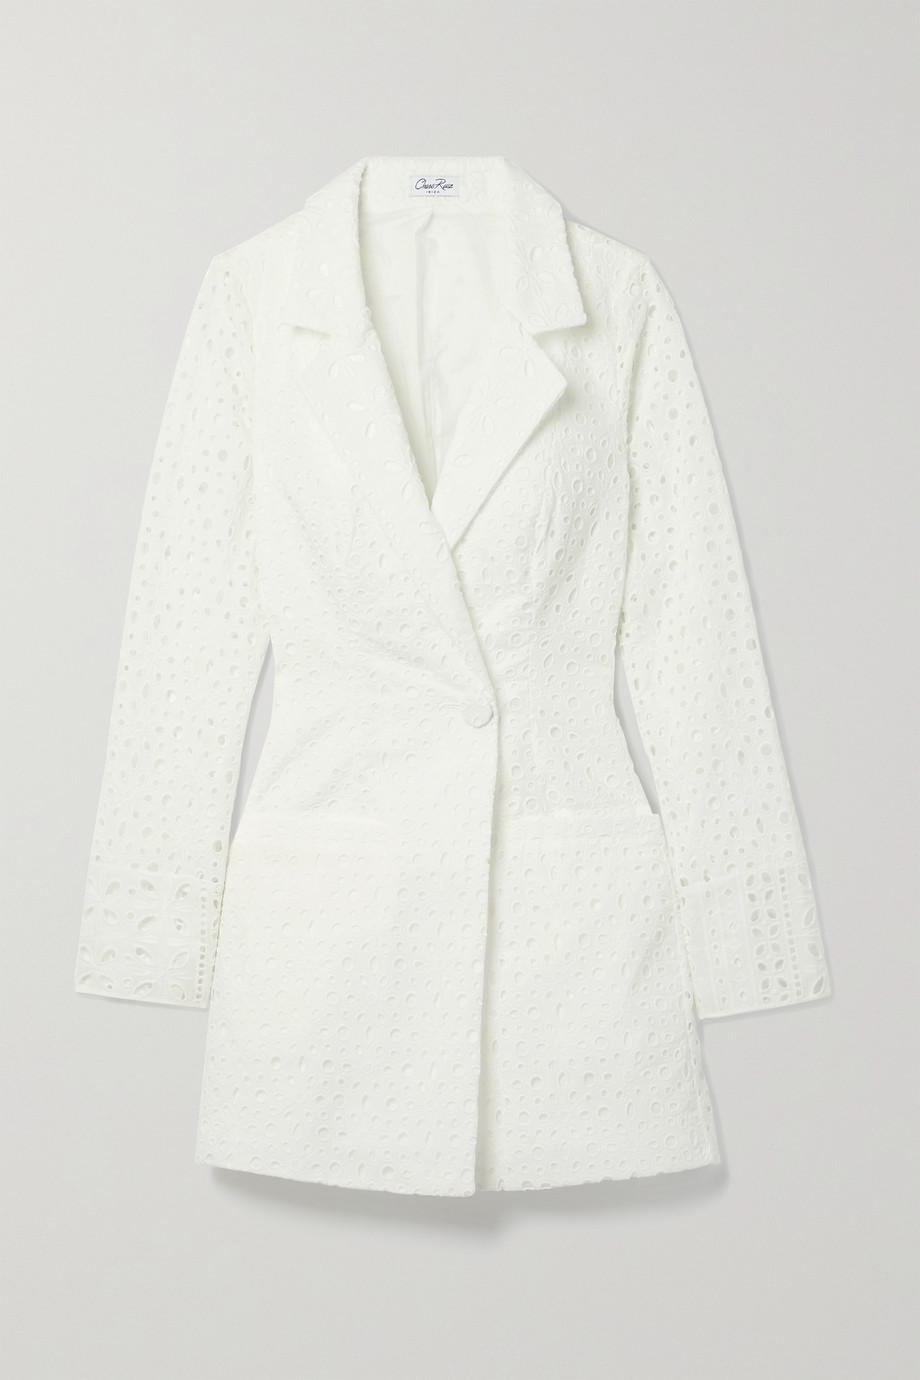 Charo Ruiz Verna broderie anglaise cotton-blend blazer